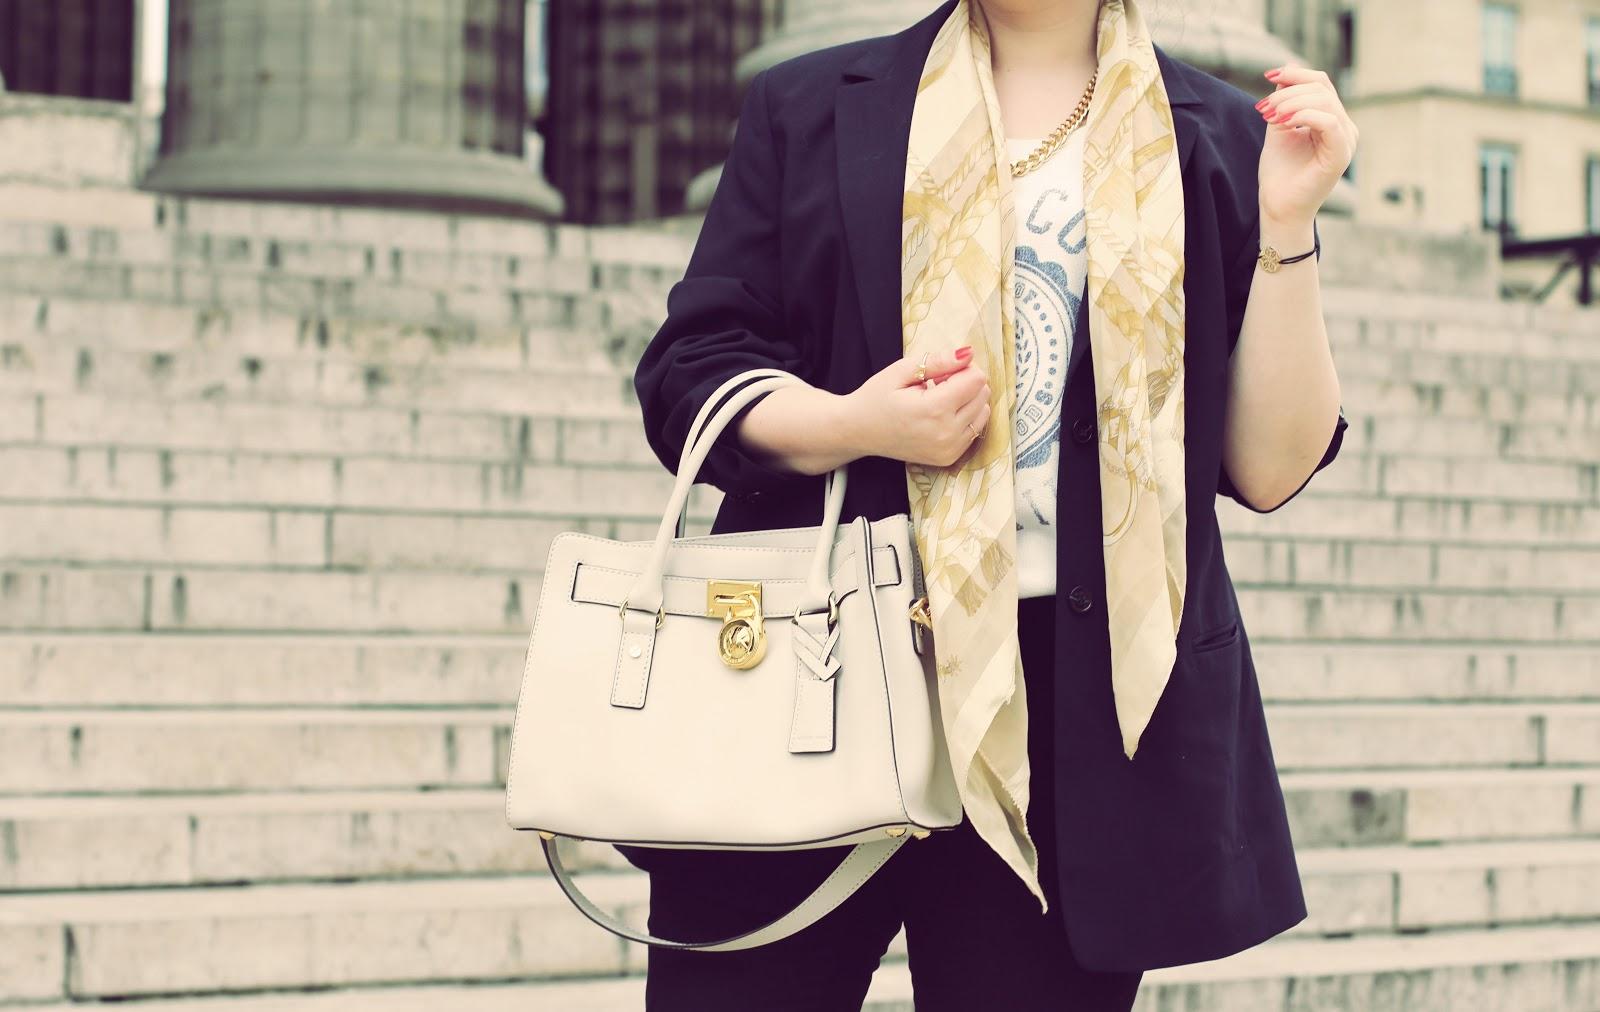 Derbies Blanches & Veste d'Homme - Blog Mode